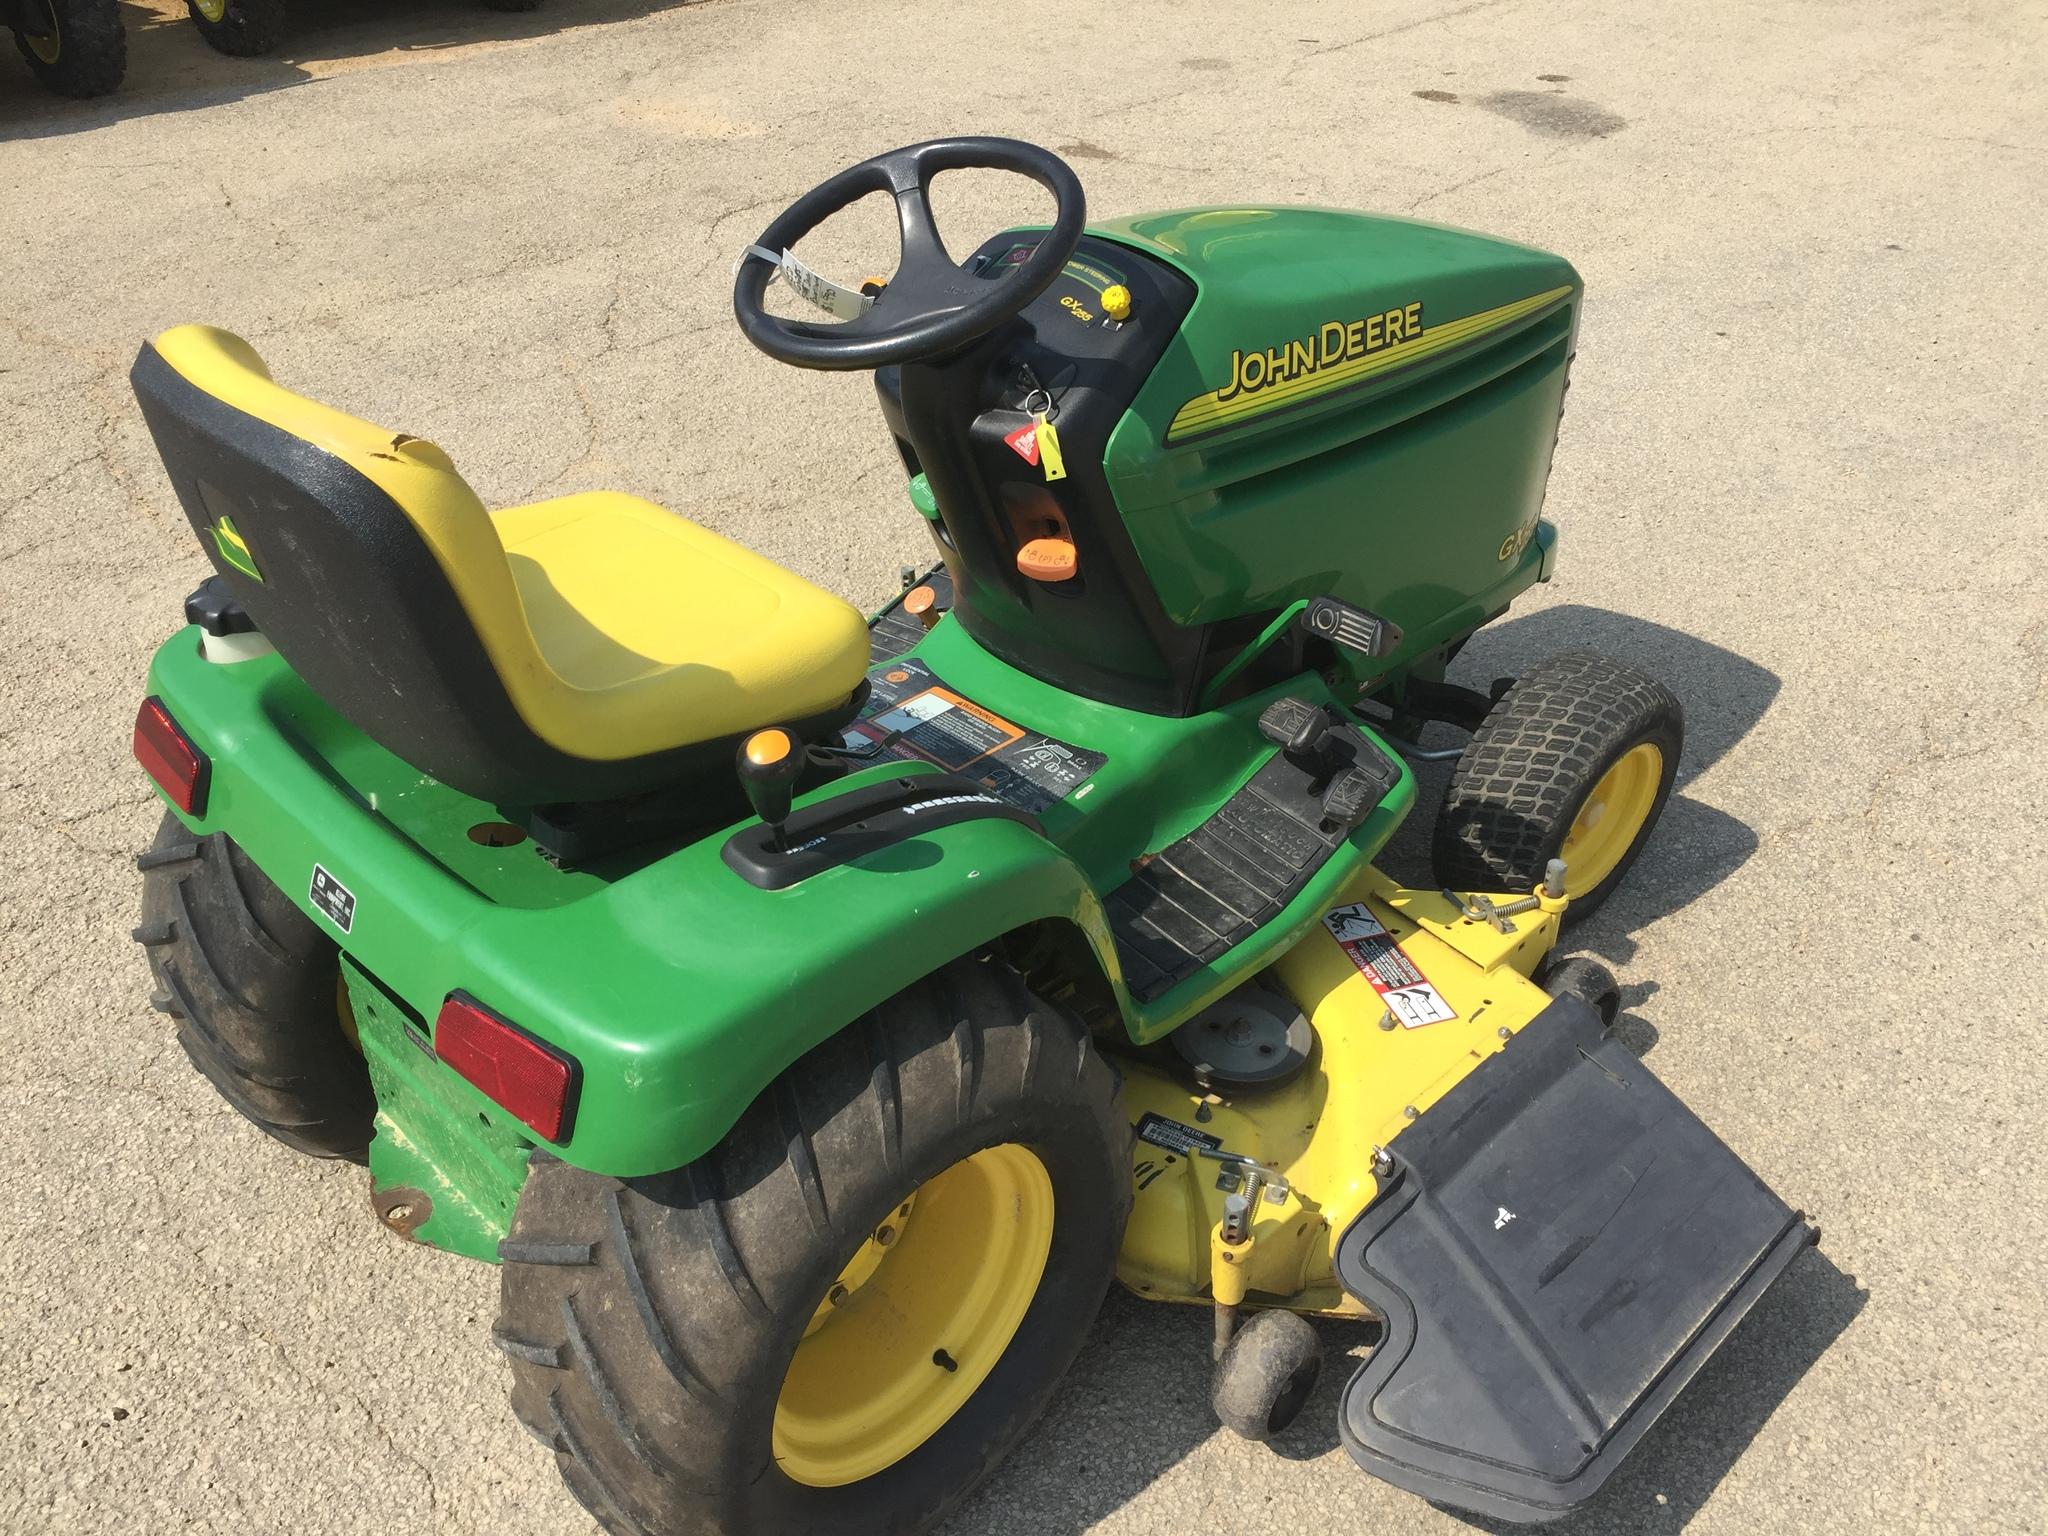 John Deere D110 Service Manual Mower Belt Diagram Hd Walls Find Wallpapers 110 Lawn Tractors Ebay